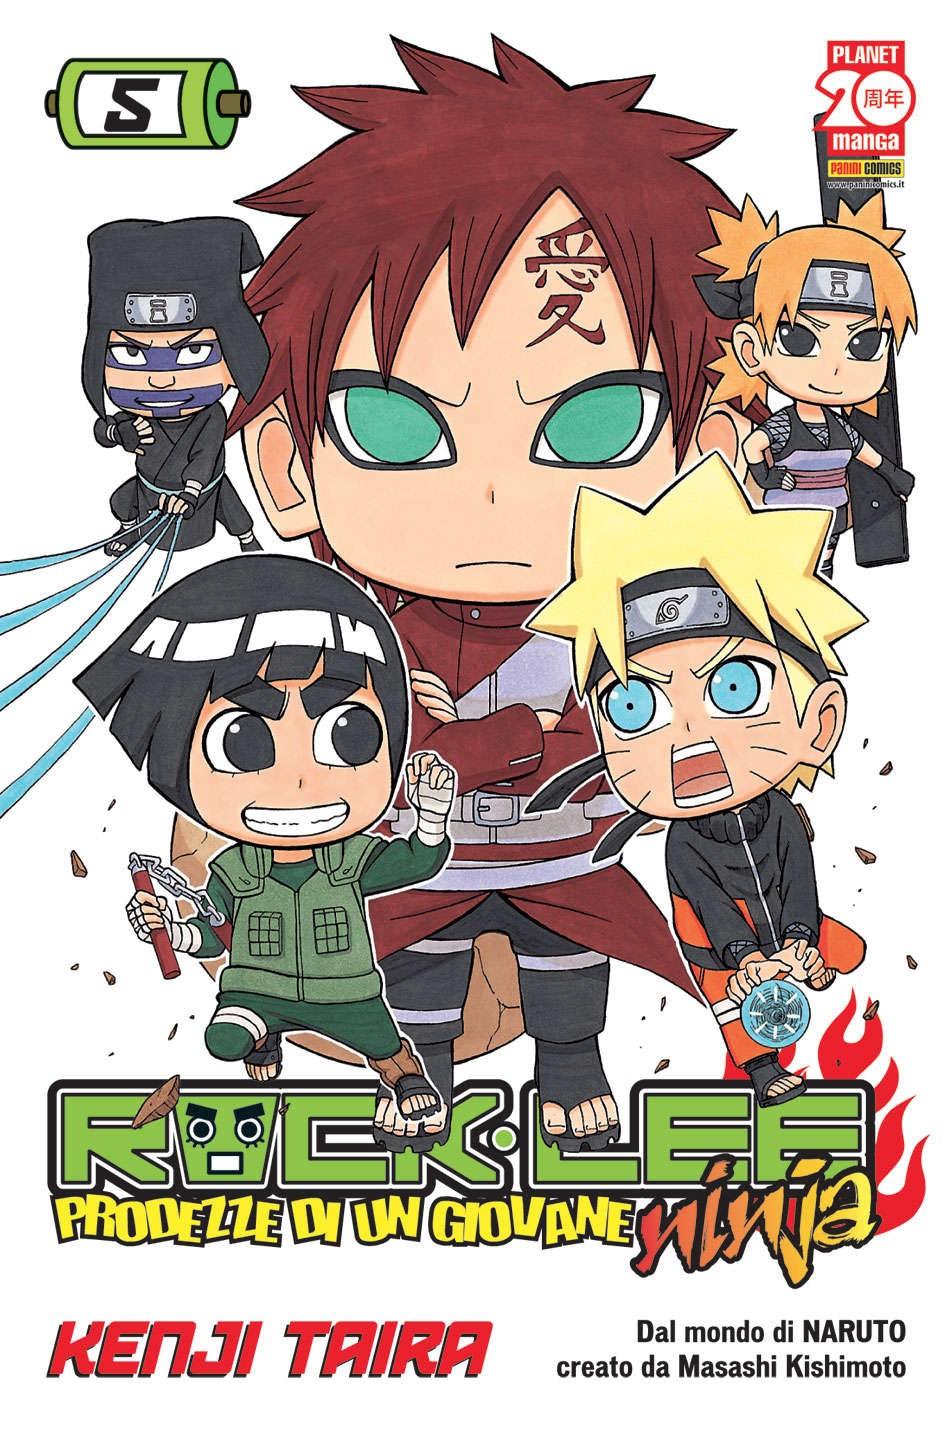 Rock Lee - N° 5 - Prodezze Di Un Giovane Ninja - Manga Rock Planet Manga